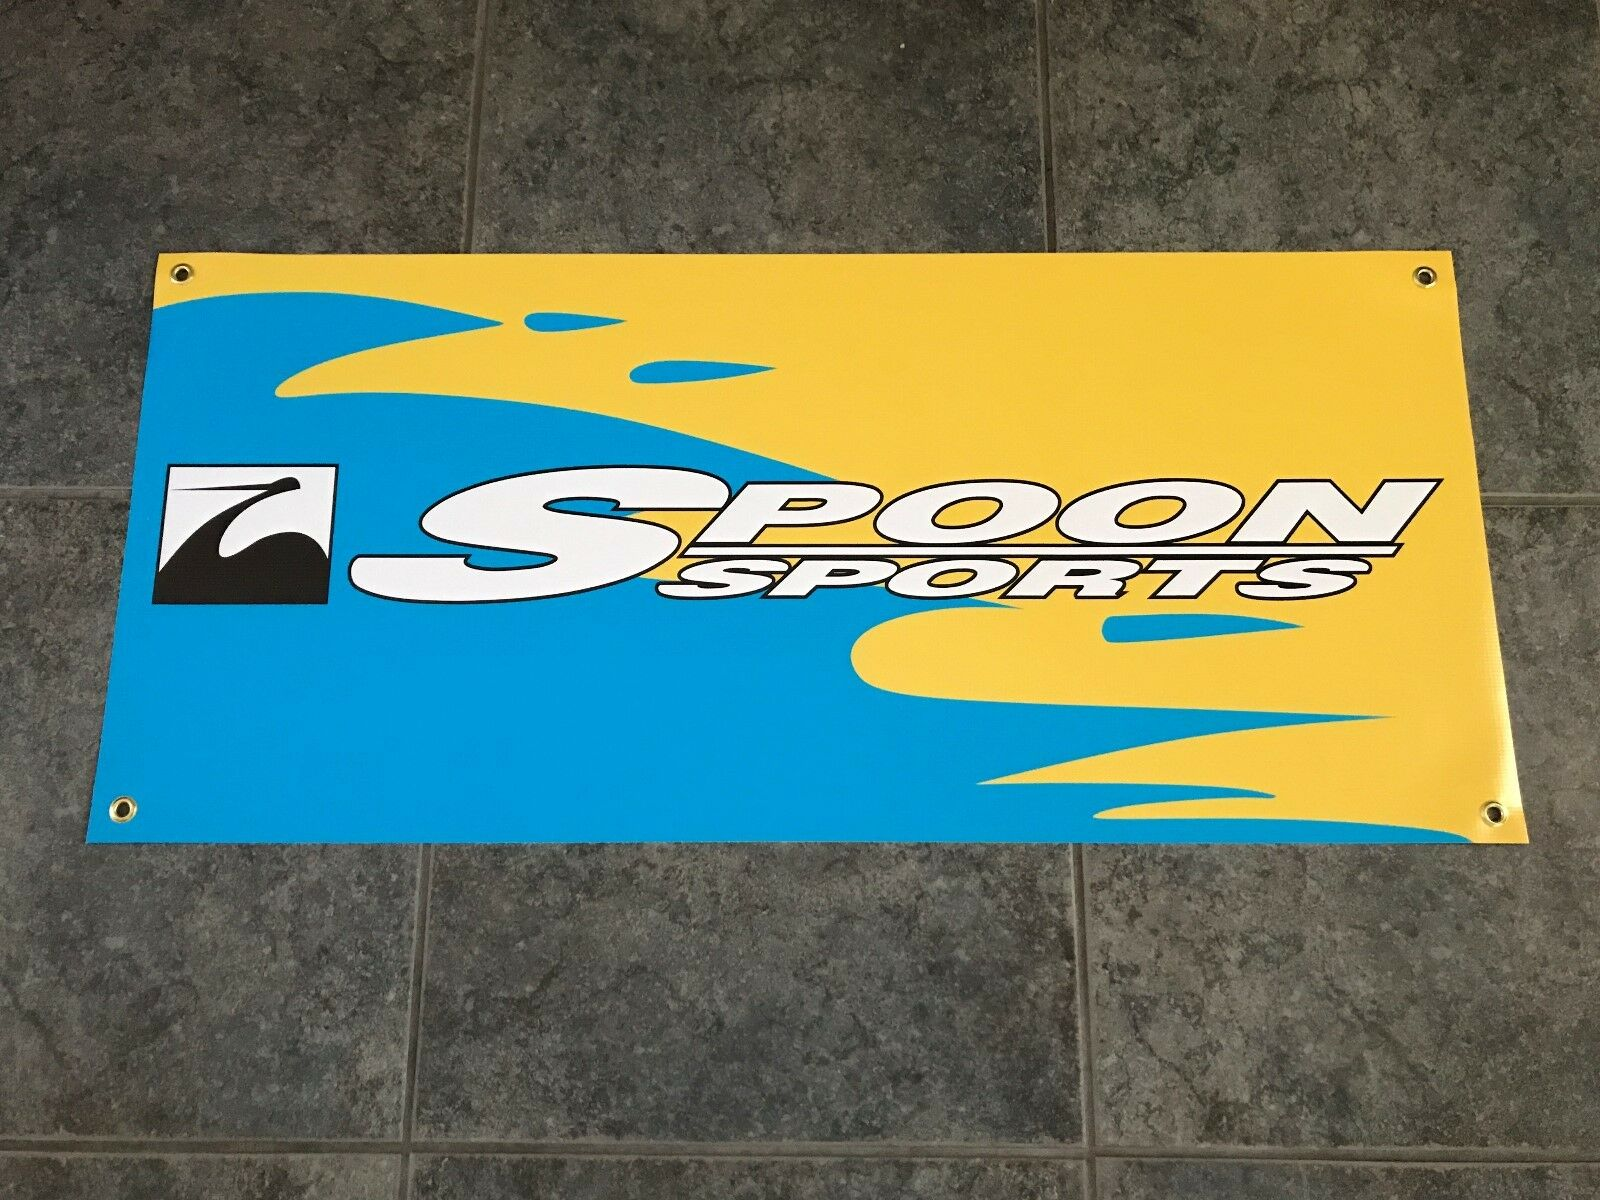 Spoon Sports Graphic Banner Sign Shop Garage Racing Tuning All Motor JDM Honda